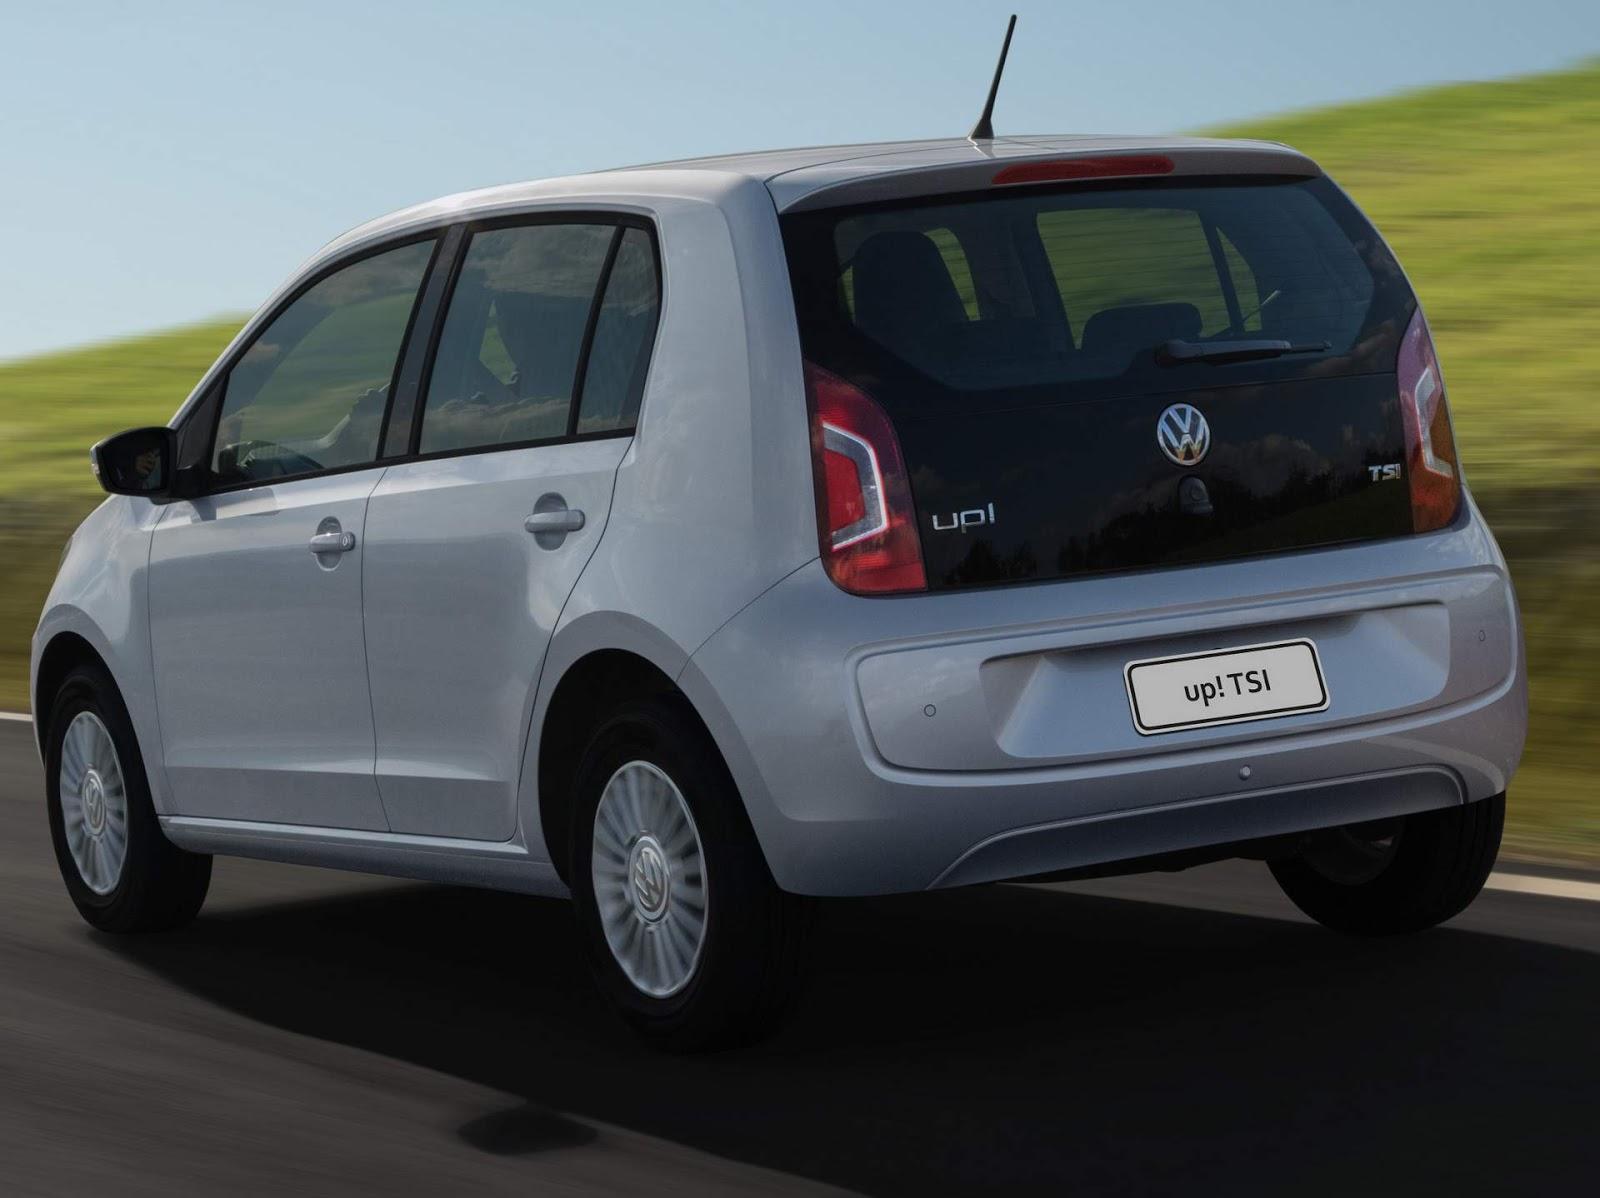 Volkswagen Up! TSI Turbo - preço